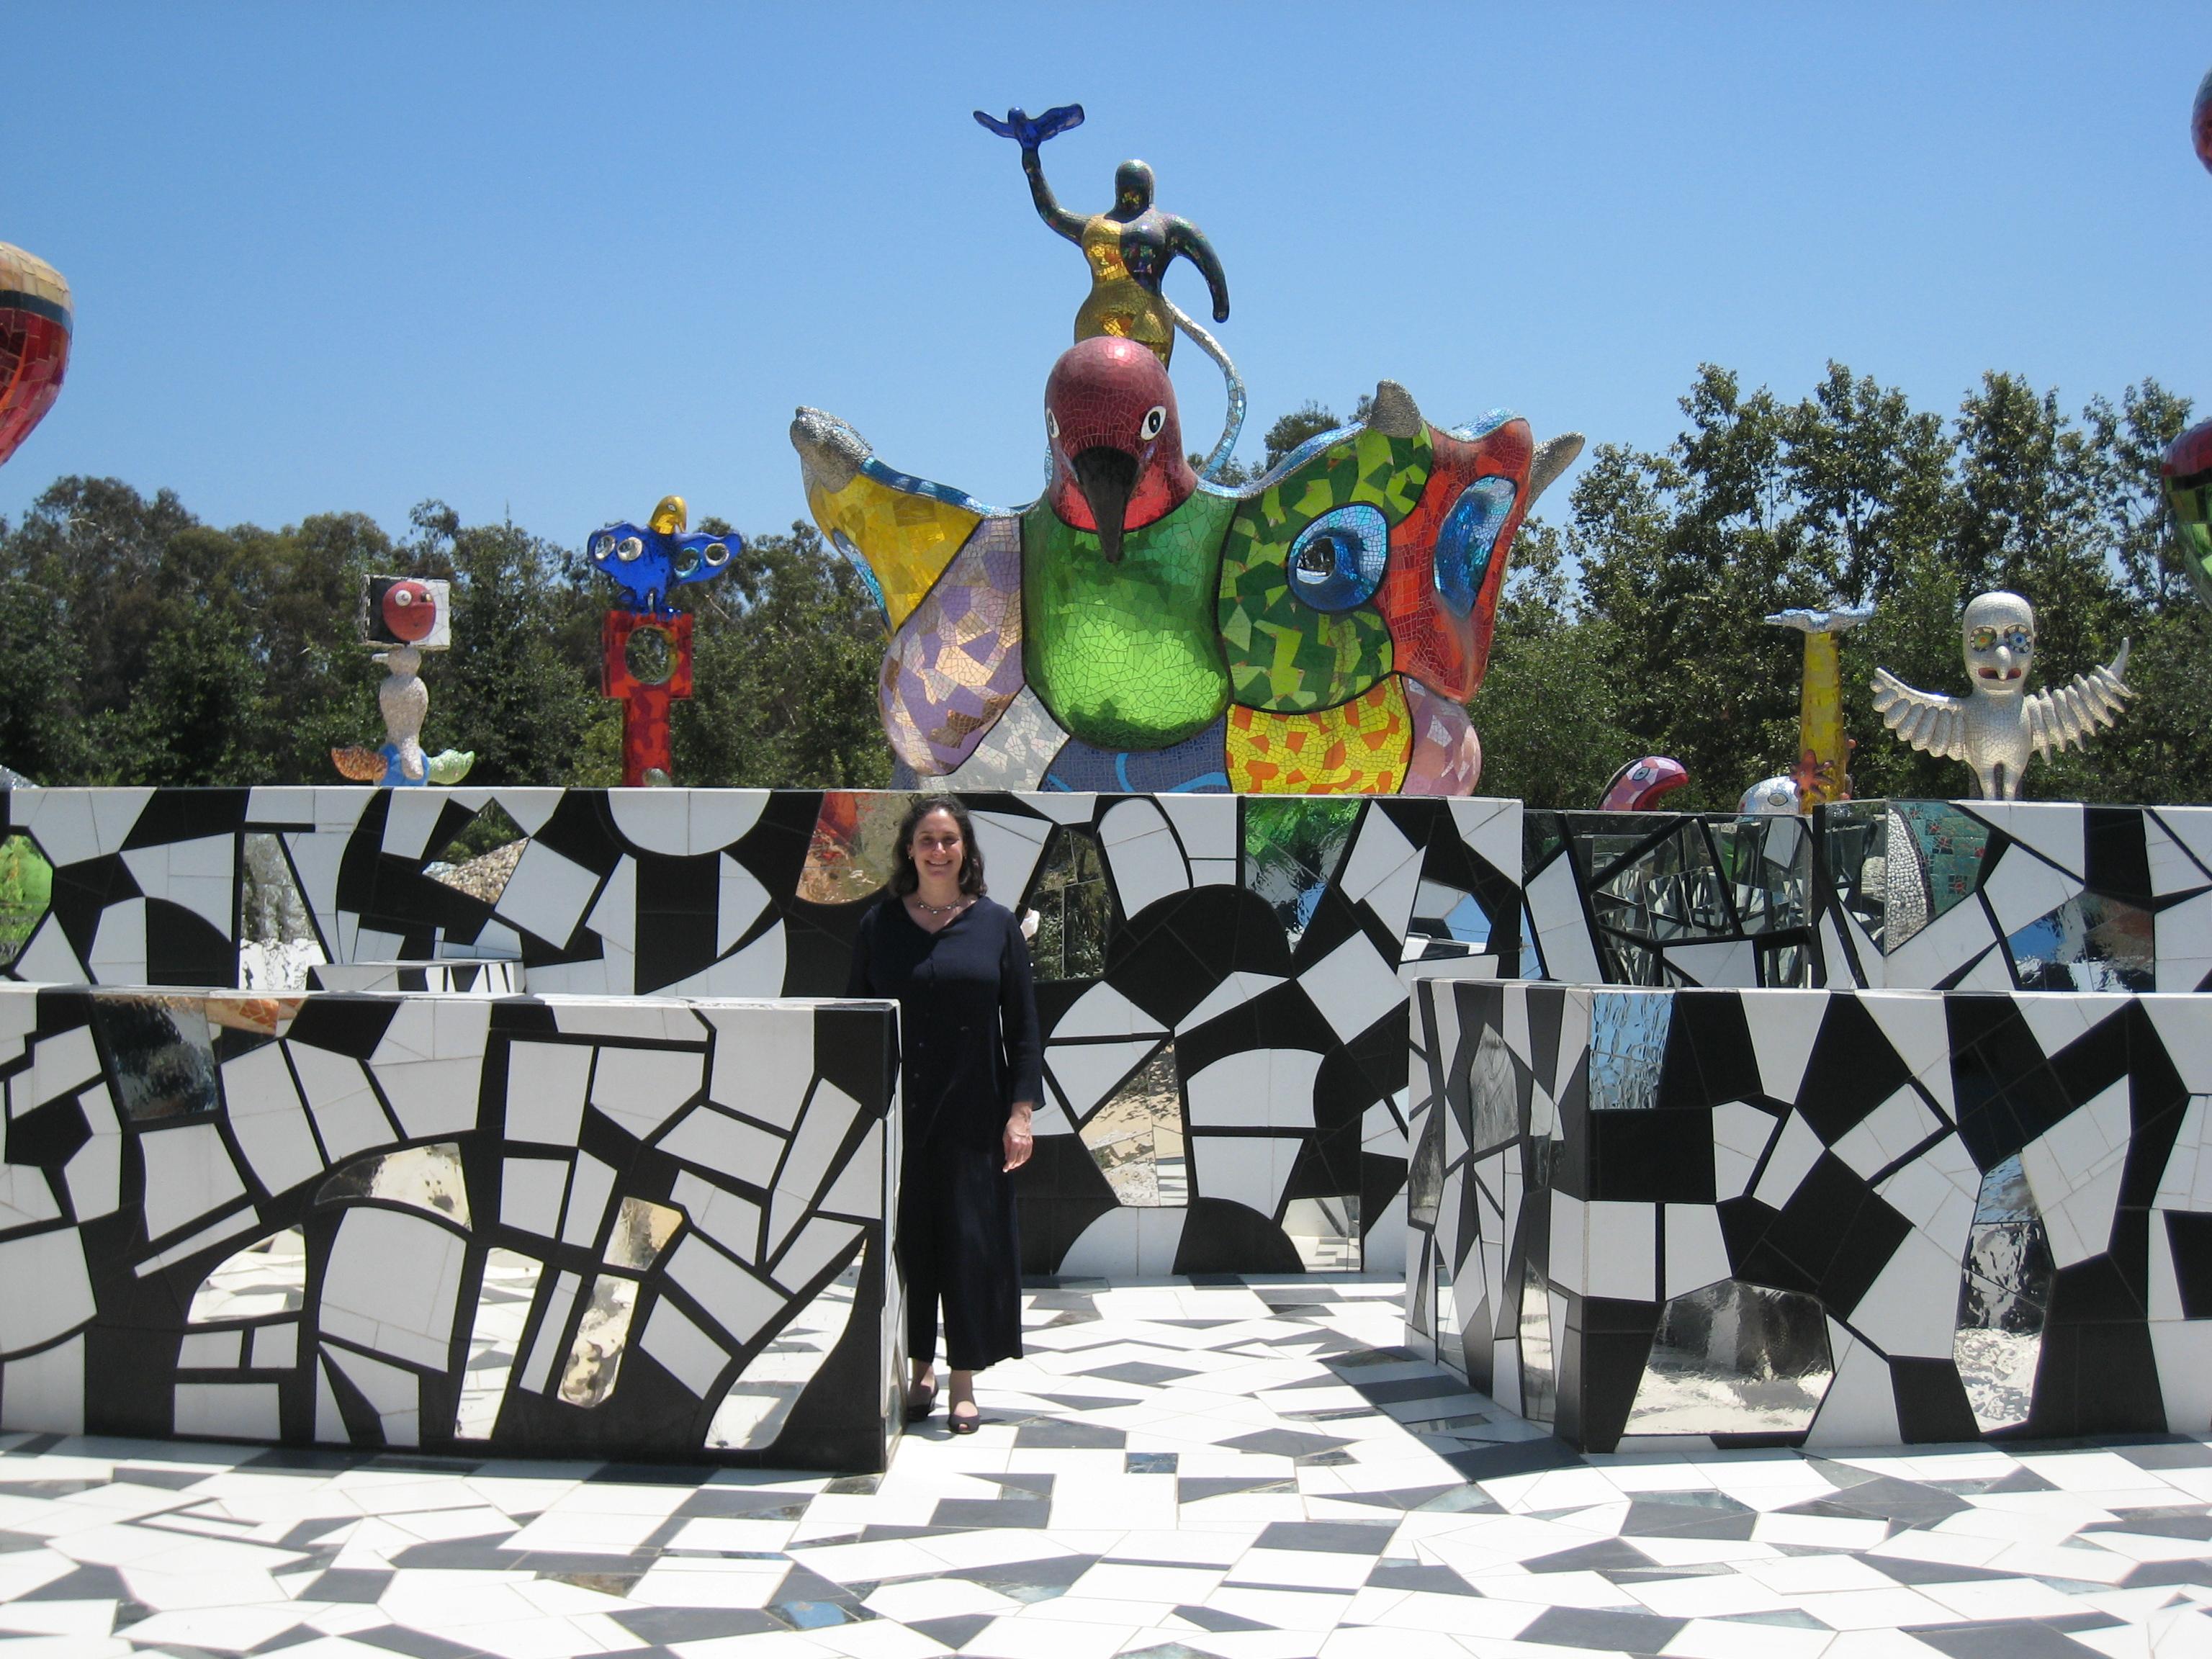 Sculpture National Avenue StrokesThe ProjectBroad New York MqSGzVpU